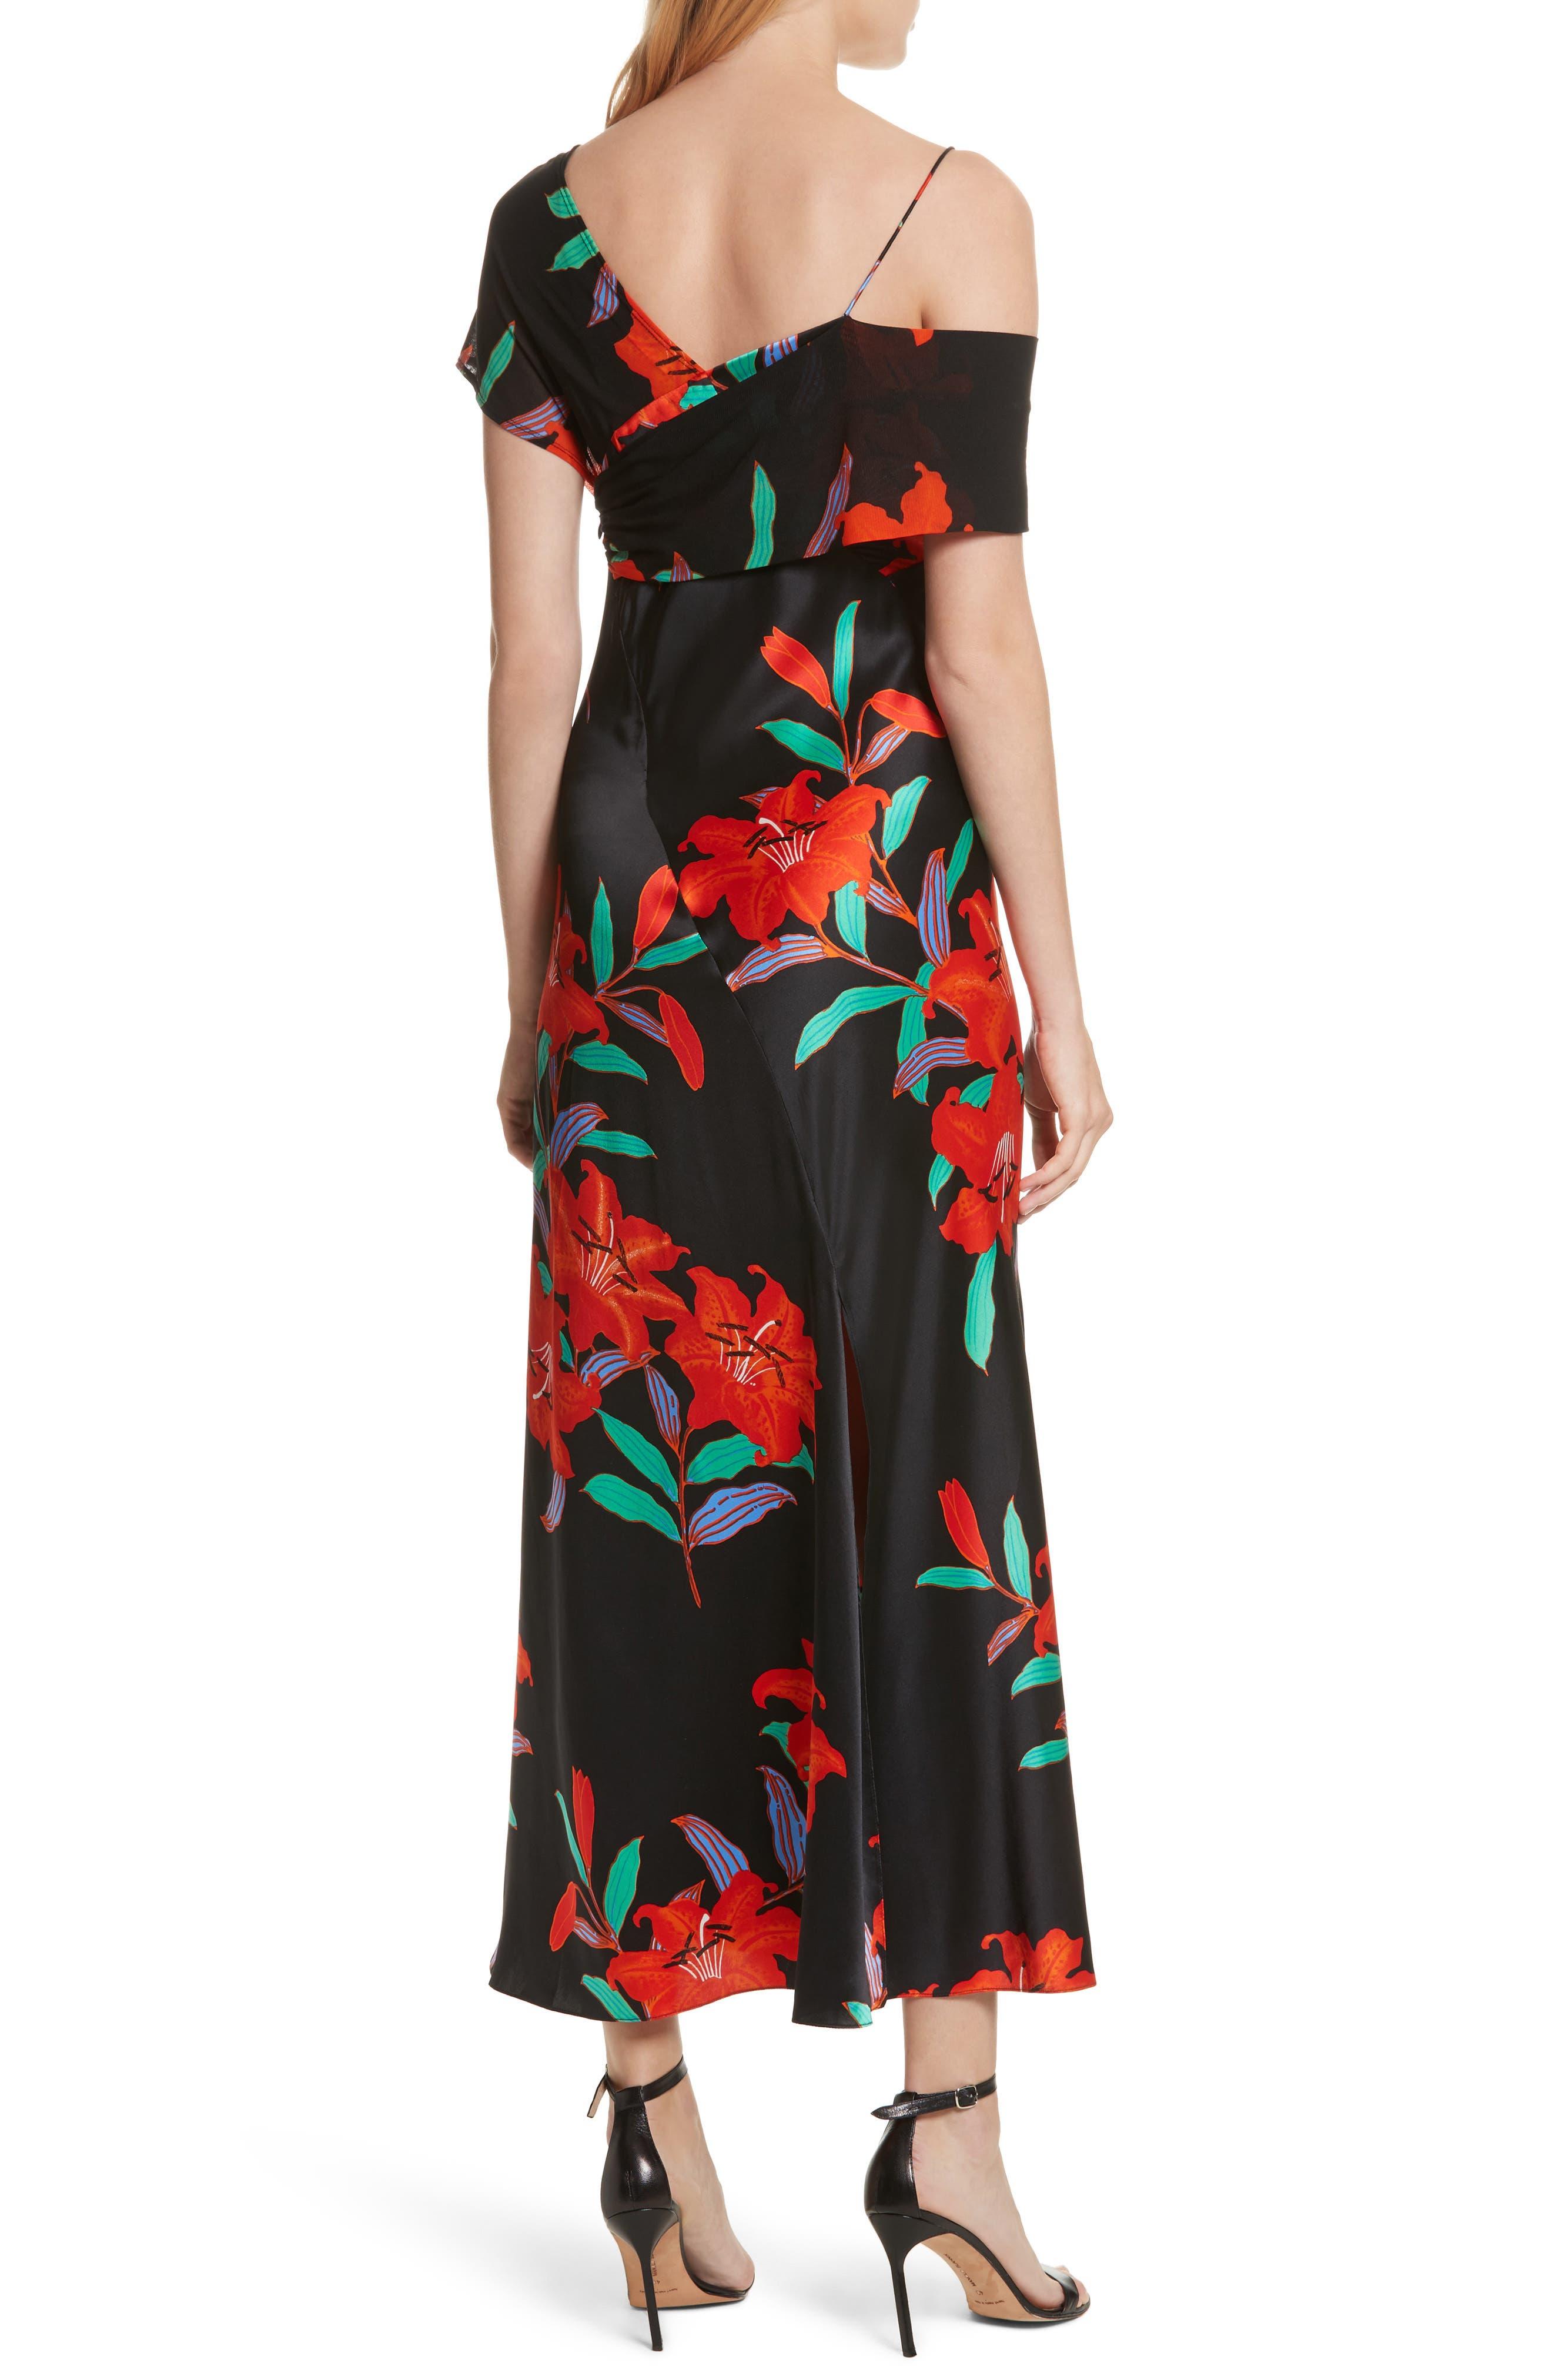 Diane von Furstenberg Asymmetrical Knotted Gown,                             Alternate thumbnail 2, color,                             Argos Black